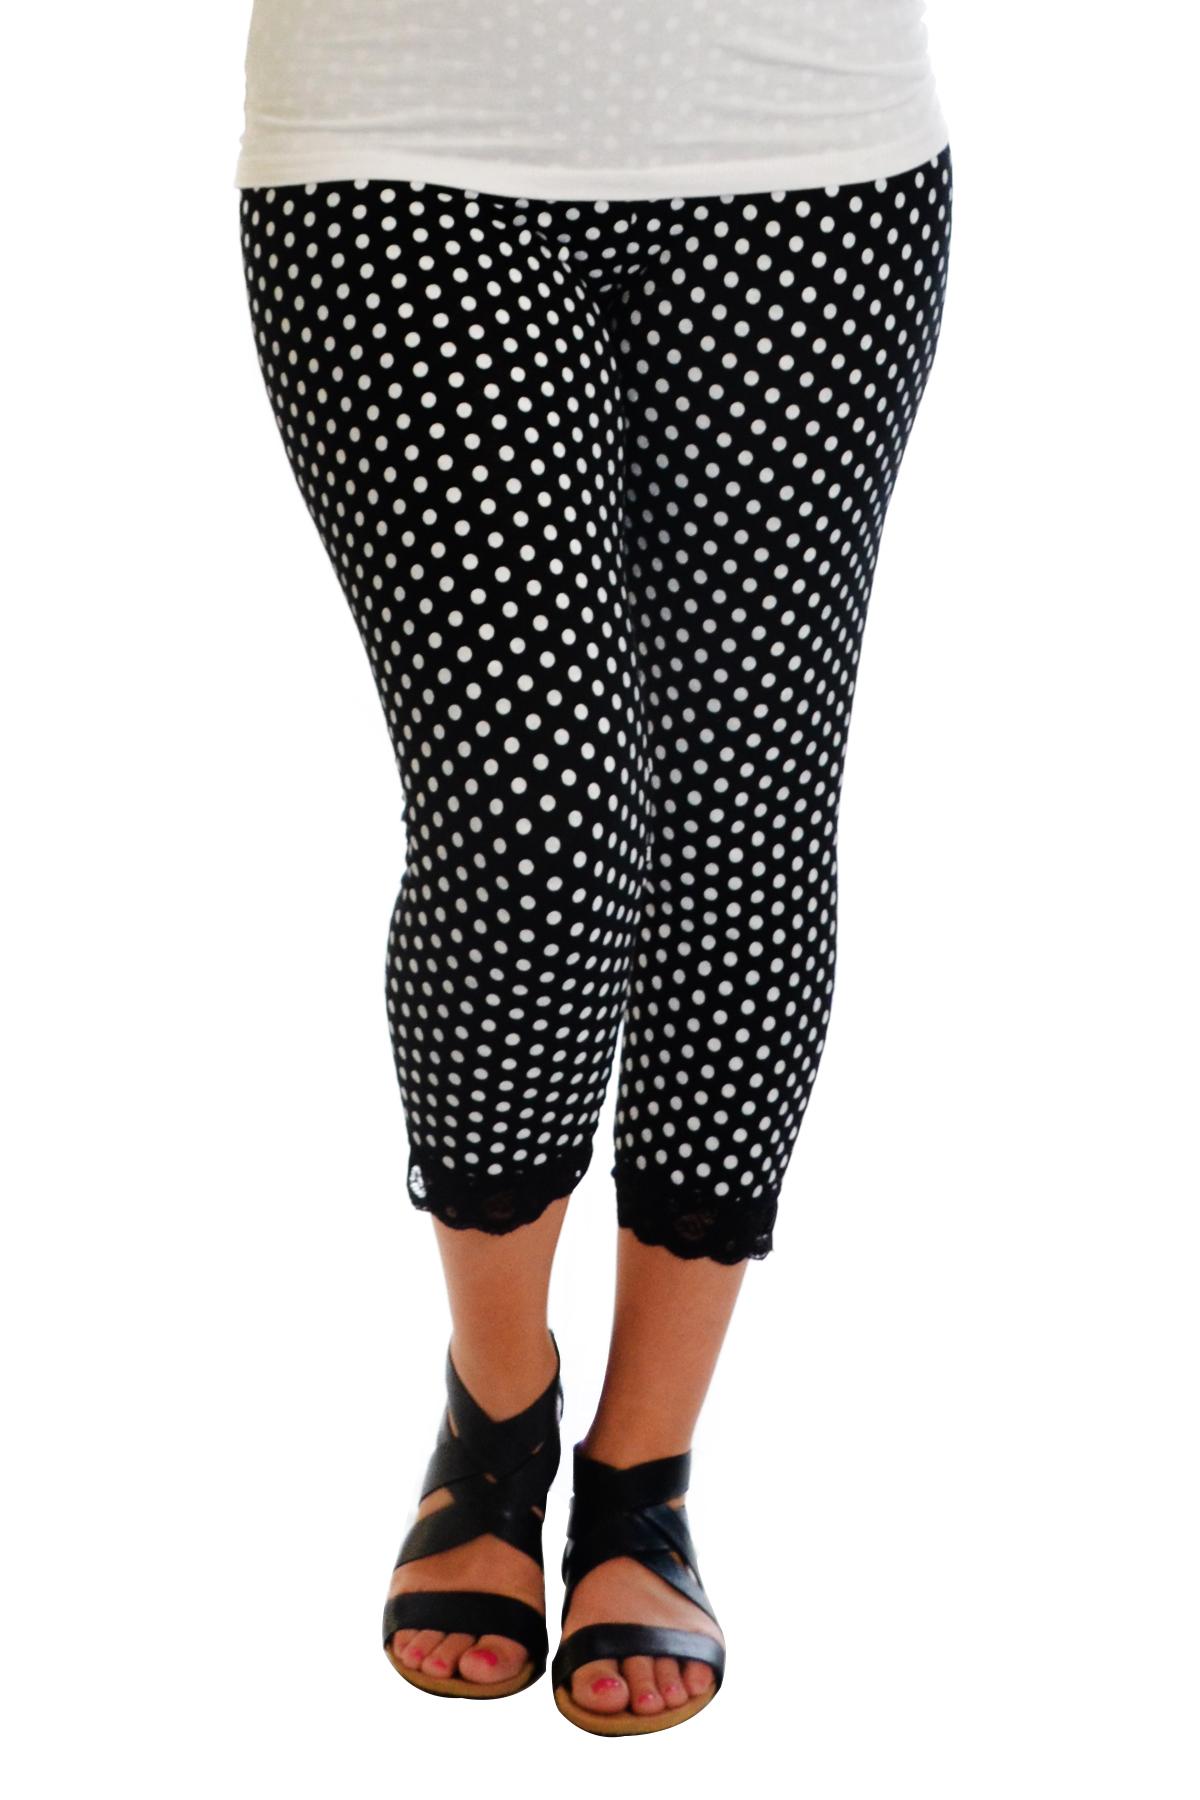 Womens New Leggings Plus Size Ladies Polka Dot Lace Trim ...